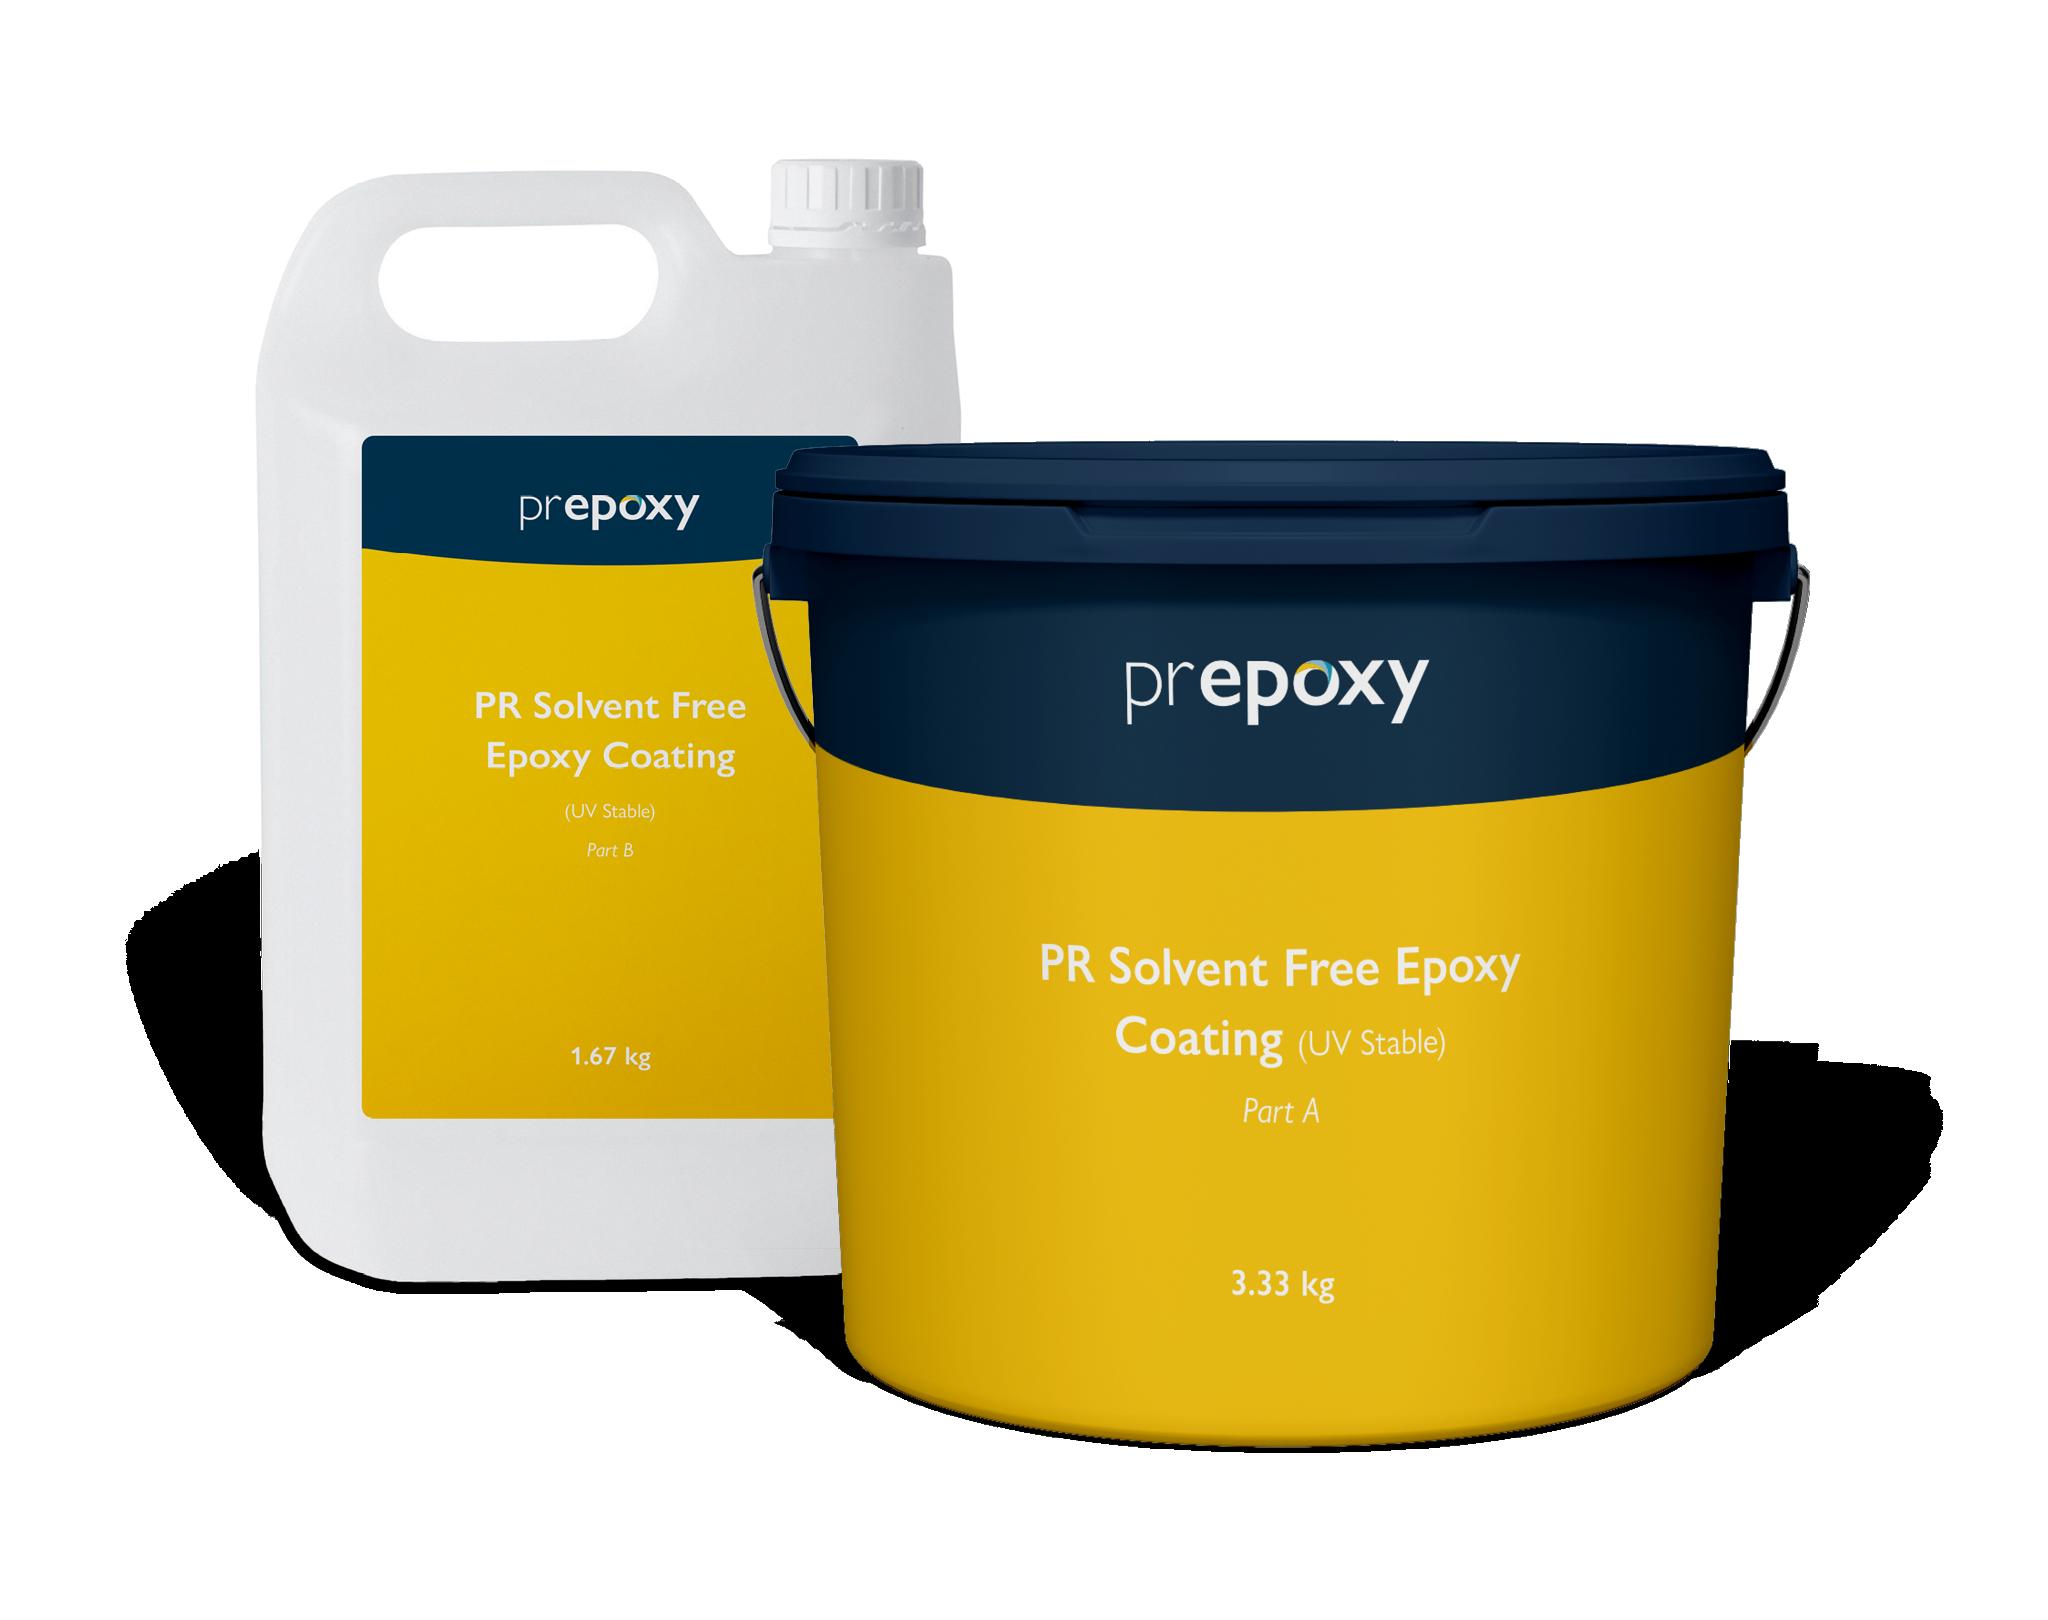 PR Solvent Free Epoxy Coating (UV Stable)